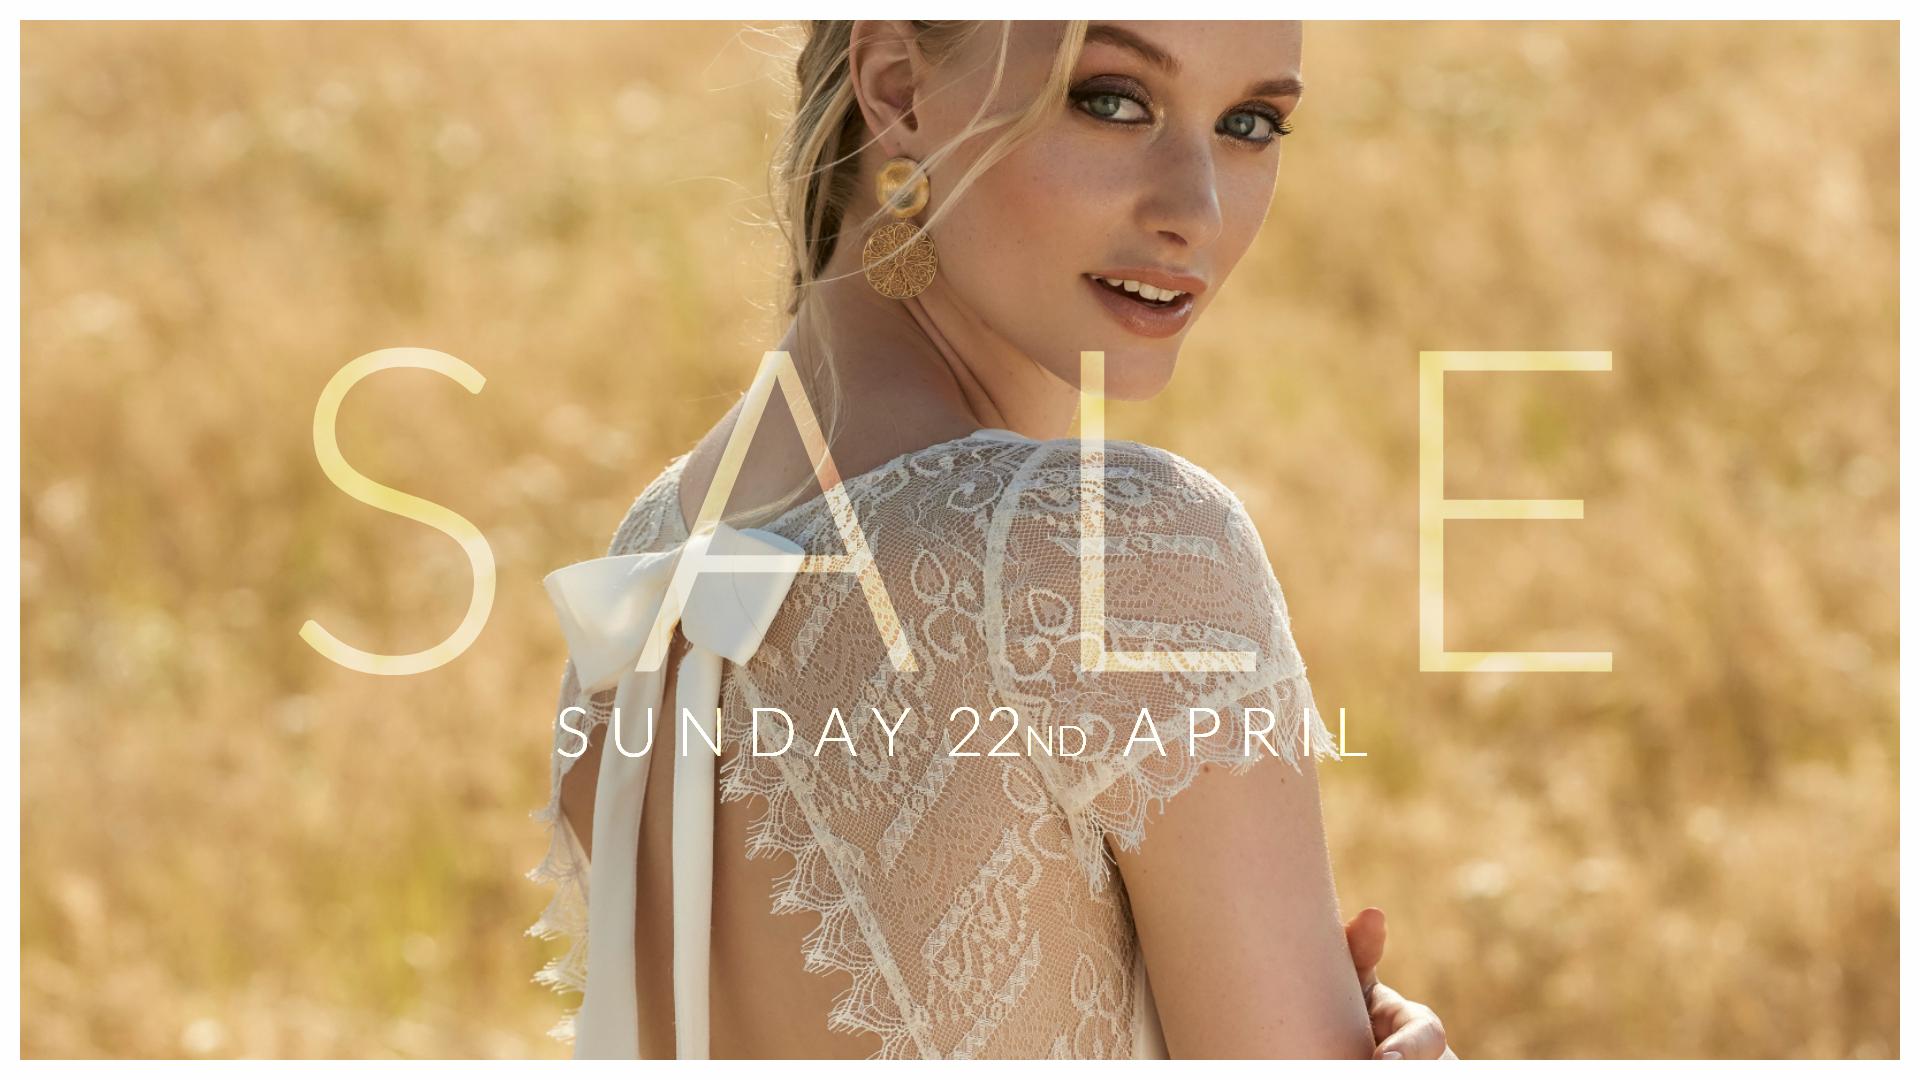 Cicily Bridal Sample Sale - 22nd April 2018